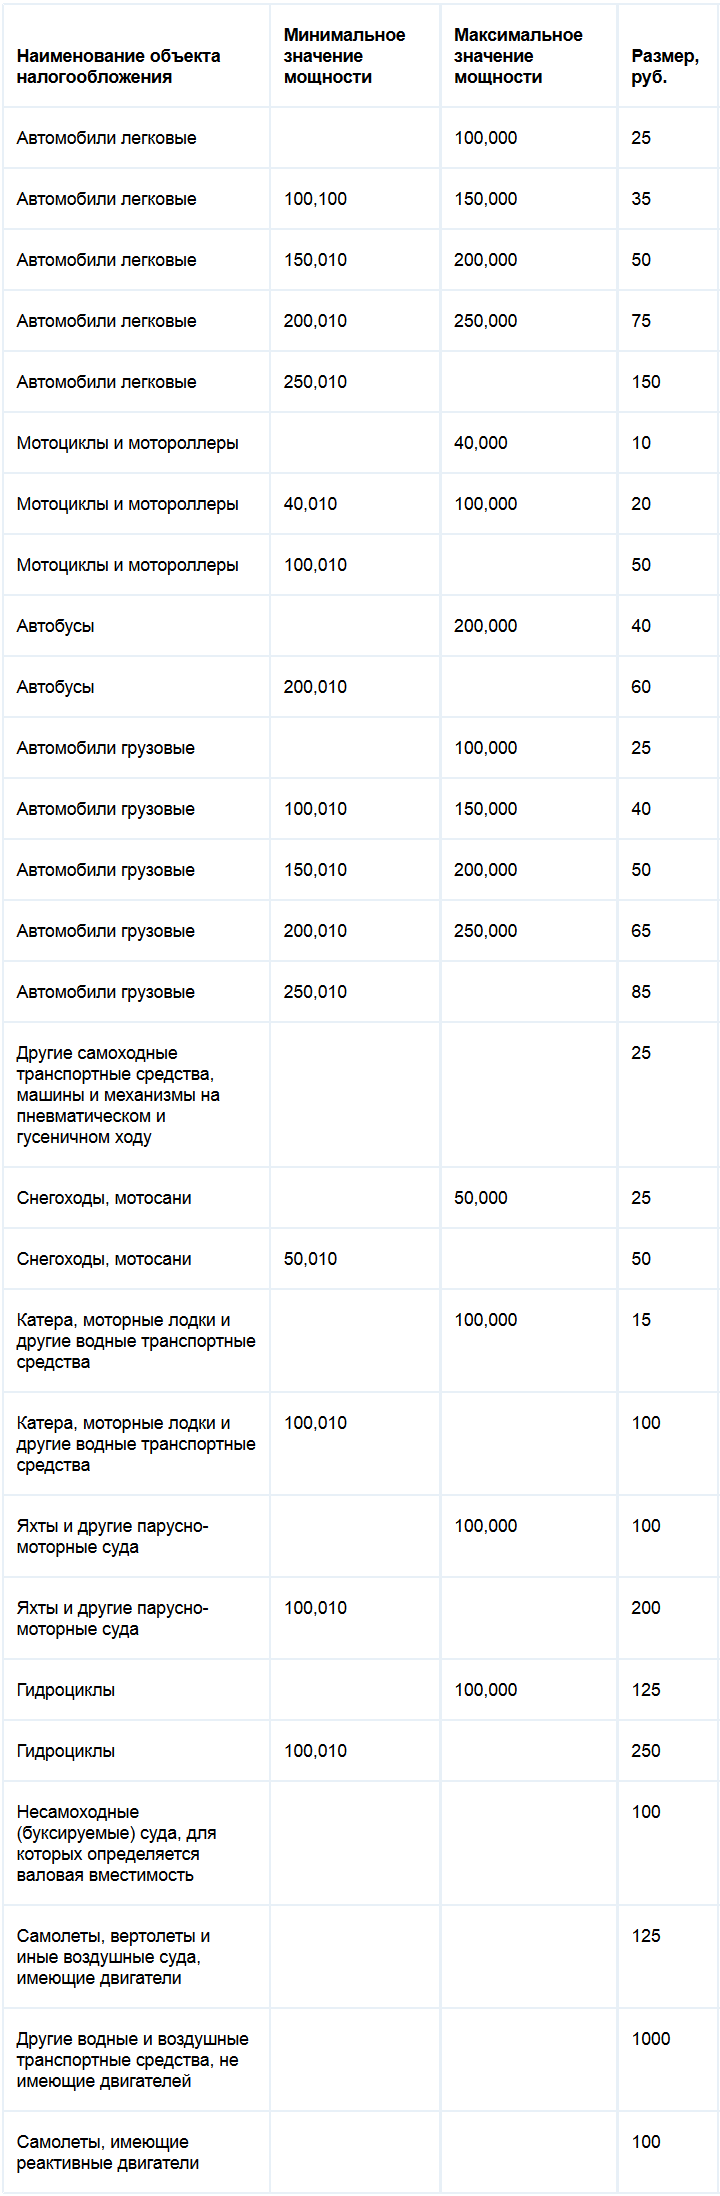 Ставки транспортного налога Вологодской области